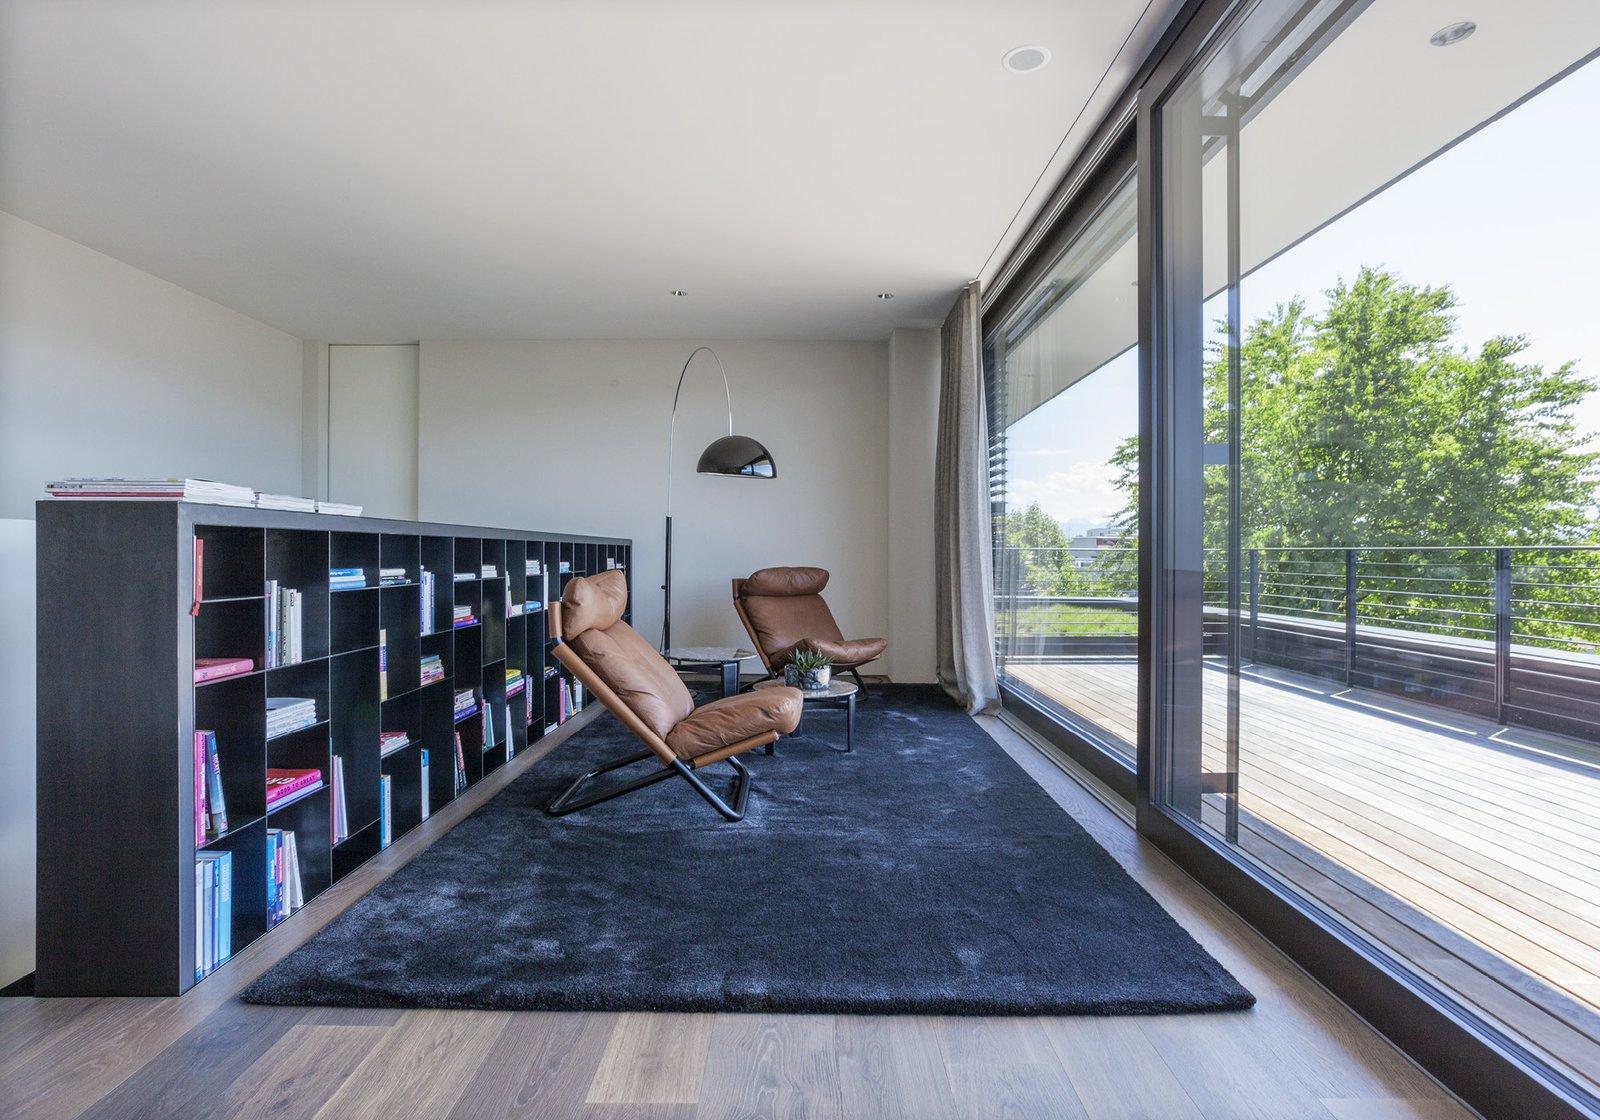 Living Room, Bookcase, Chair, and Medium Hardwood Floor  Object 336 - beautiful blackbox by meier architekten zurich